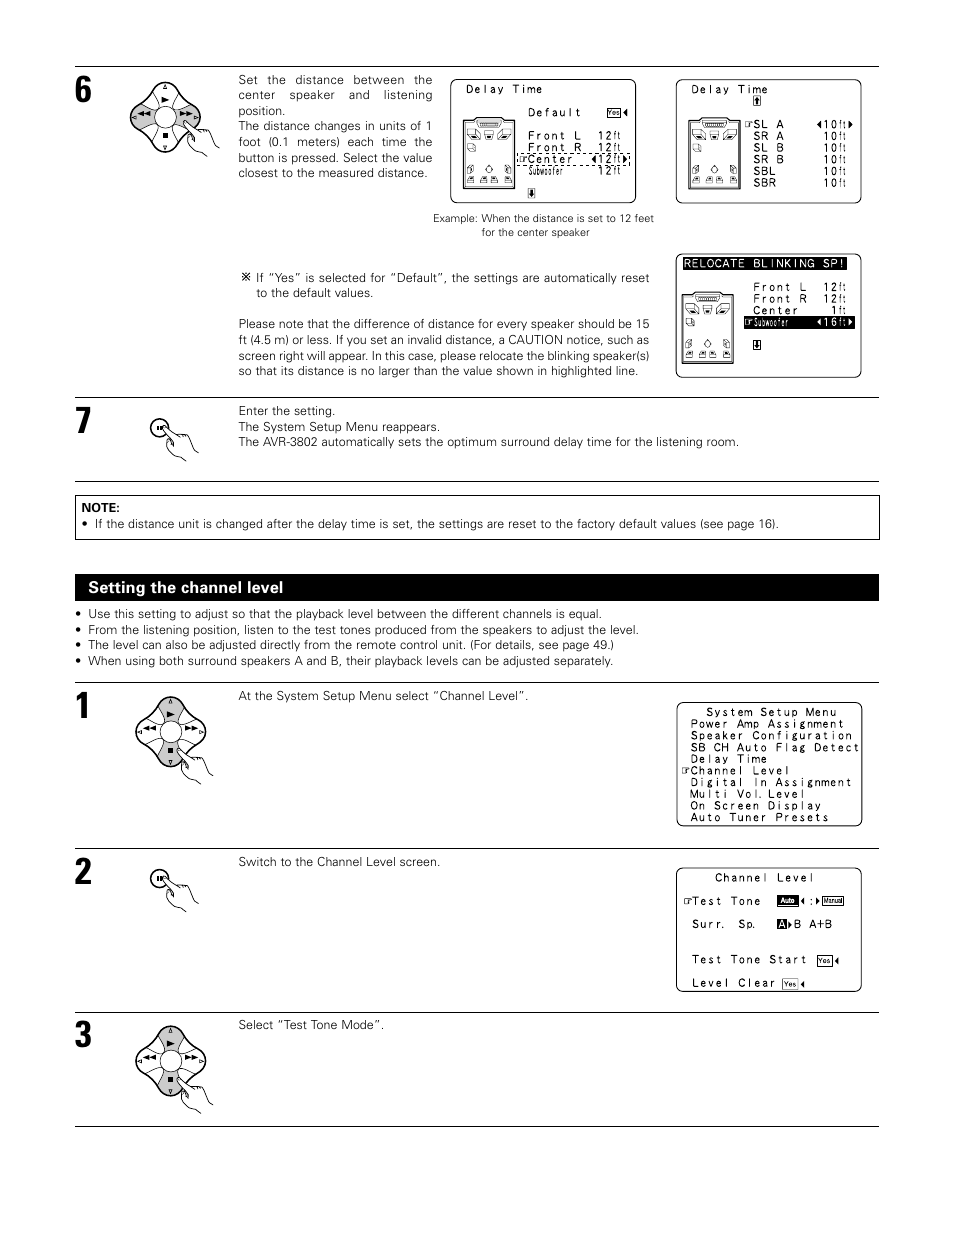 Setting the channel level | Denon AVR-3802 User Manual